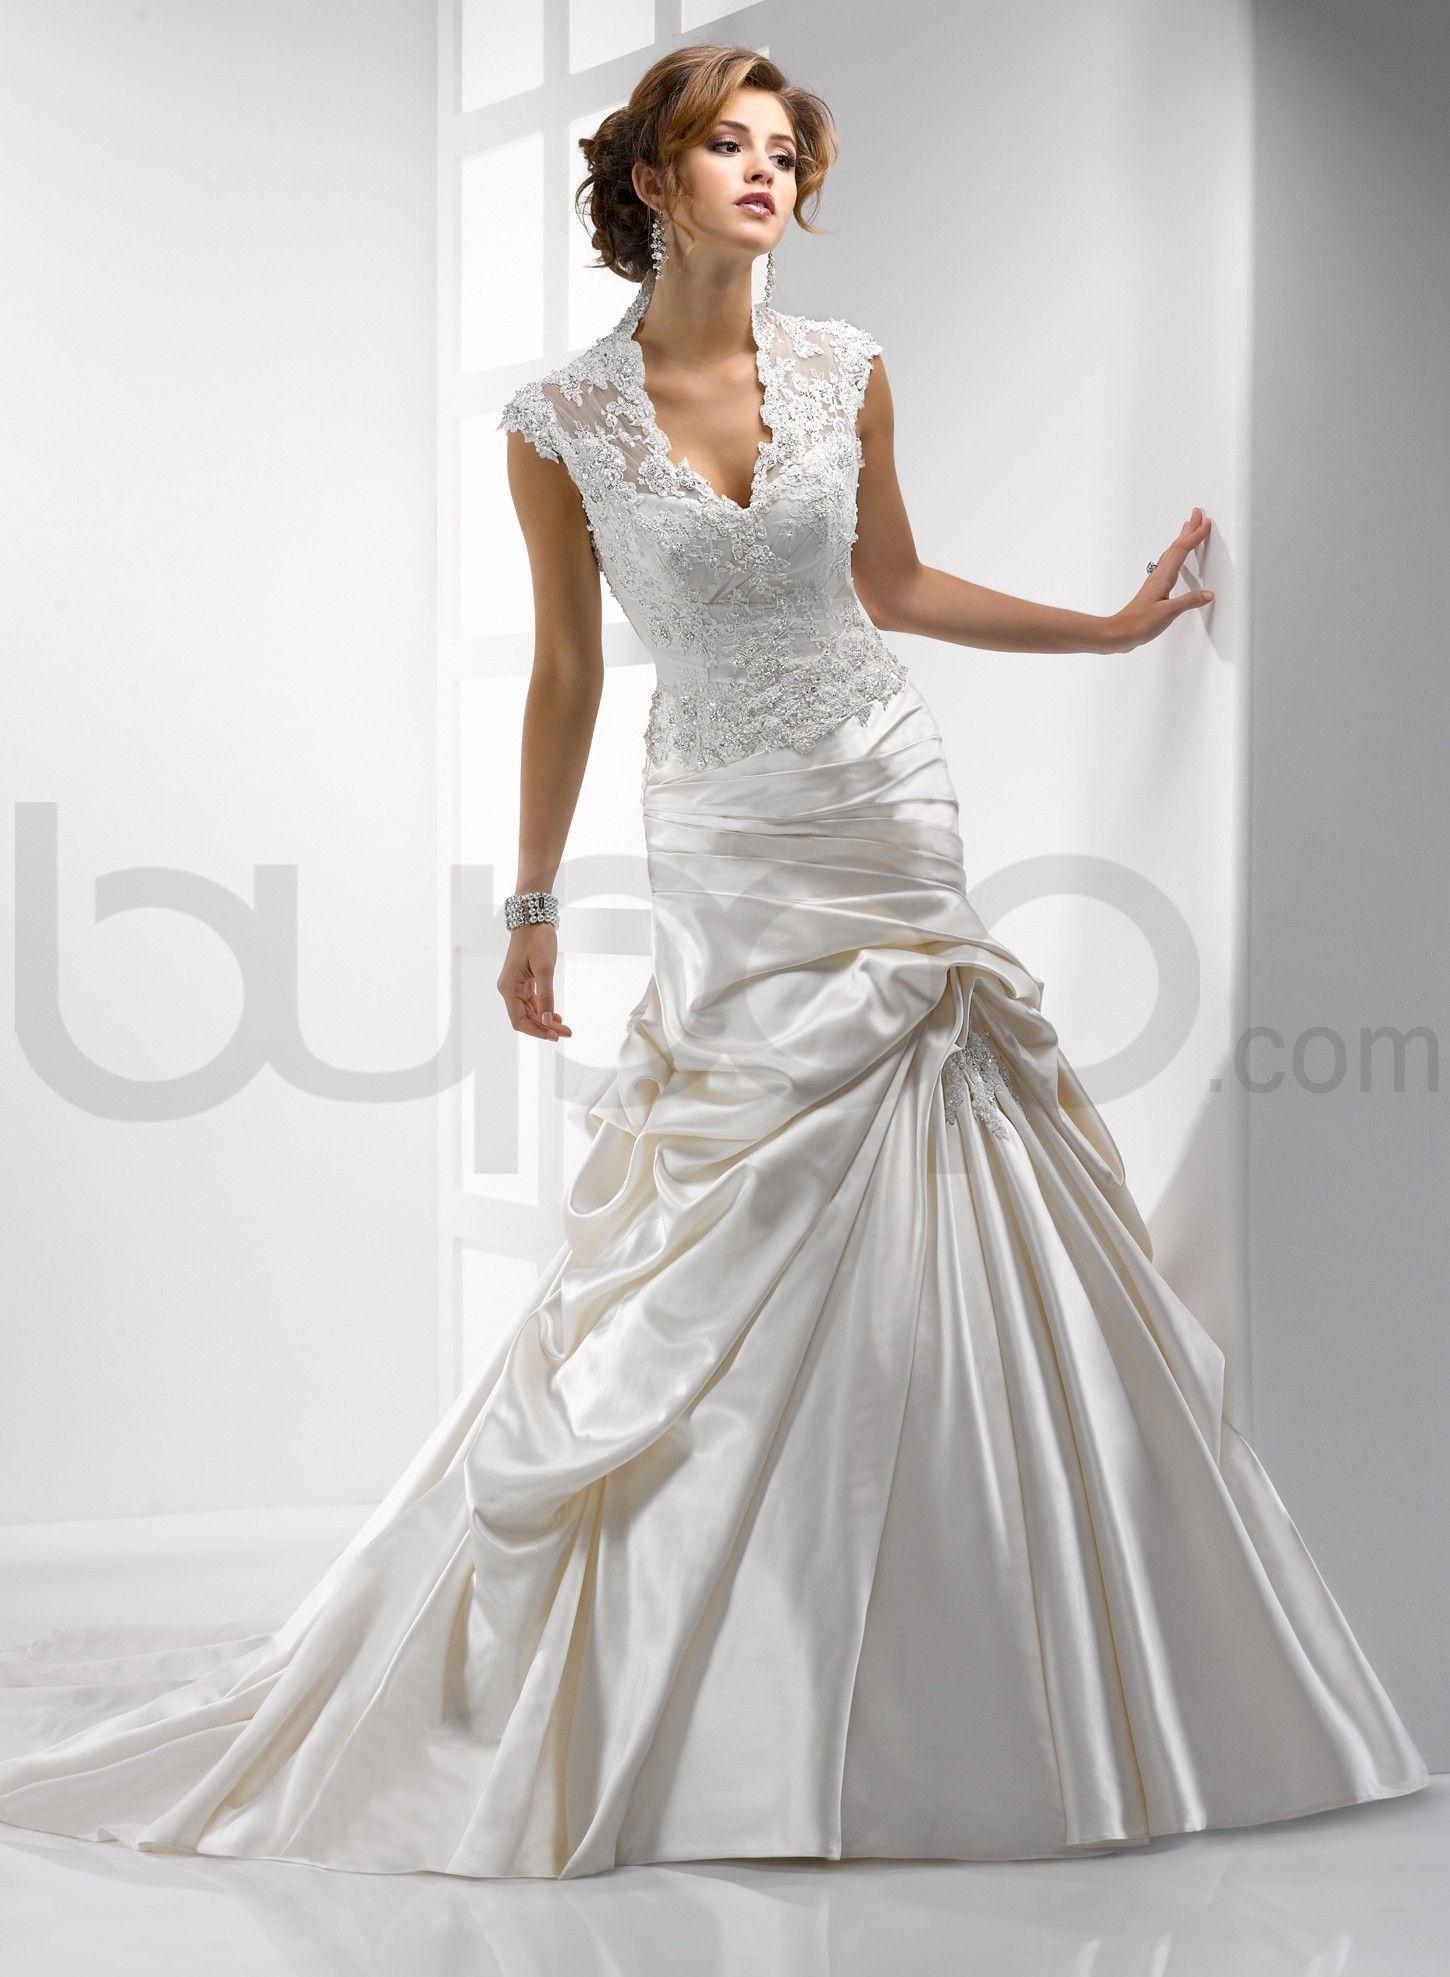 Soft Shimmer Satin A-line High-collar Deep V-neck Neckline Wedding Dress - Bupop.com